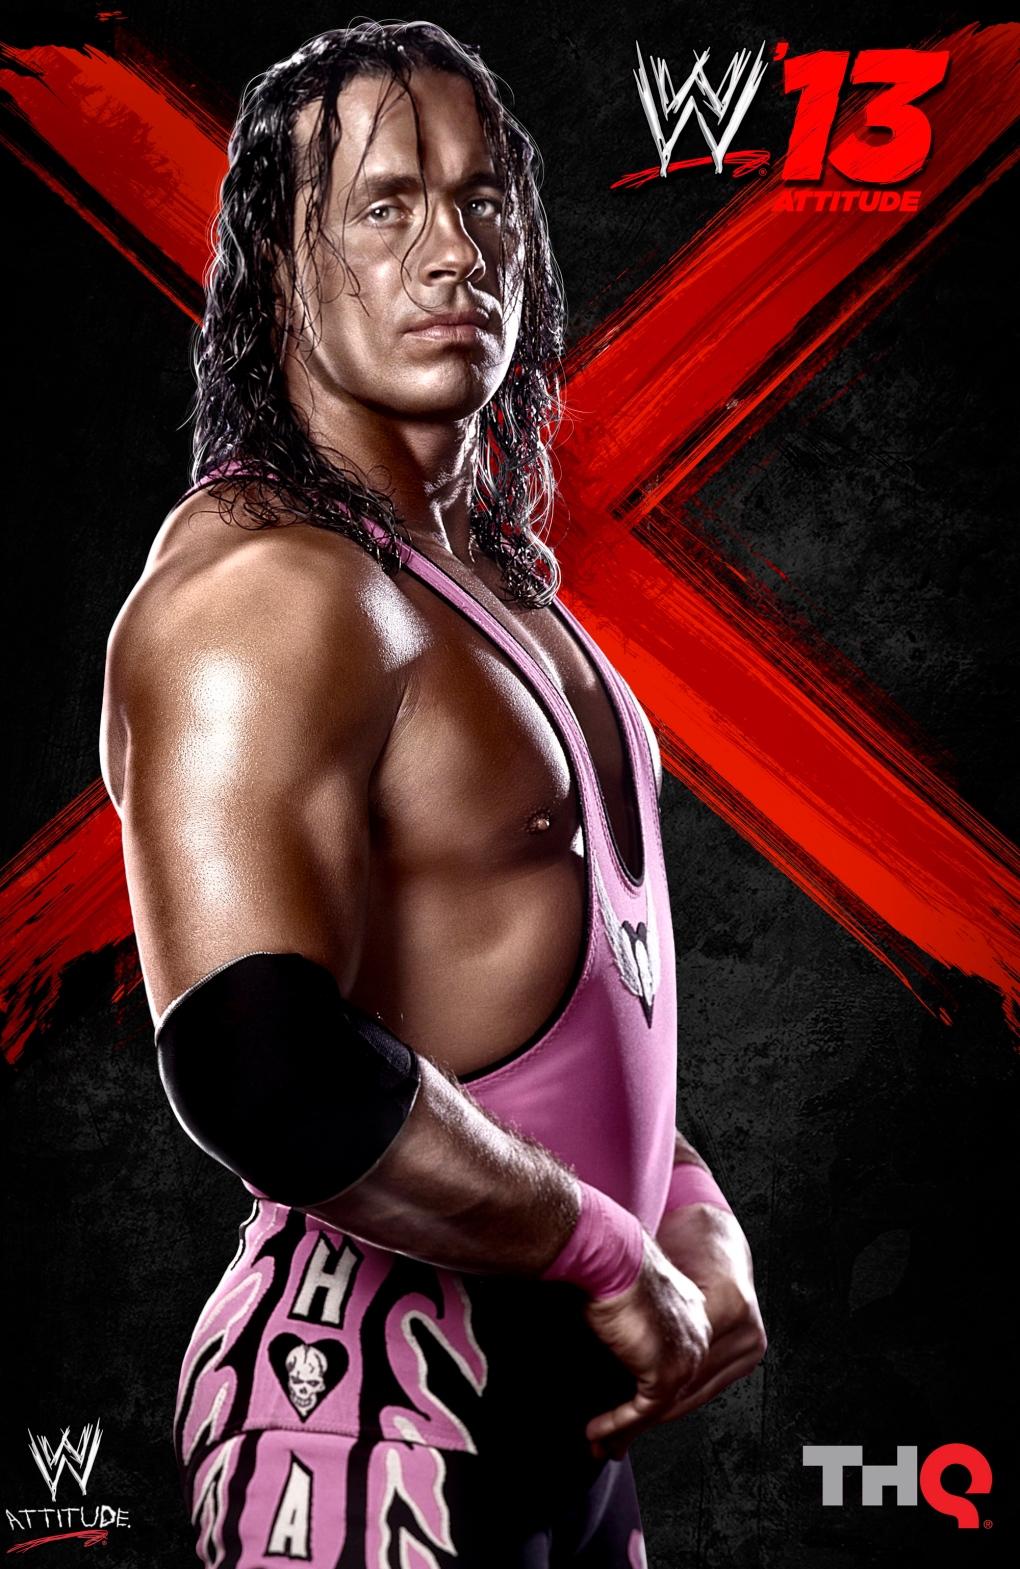 Canadian Wrestler Bret The Hitman Hart Says He Has Prostate Cancer Ctv News